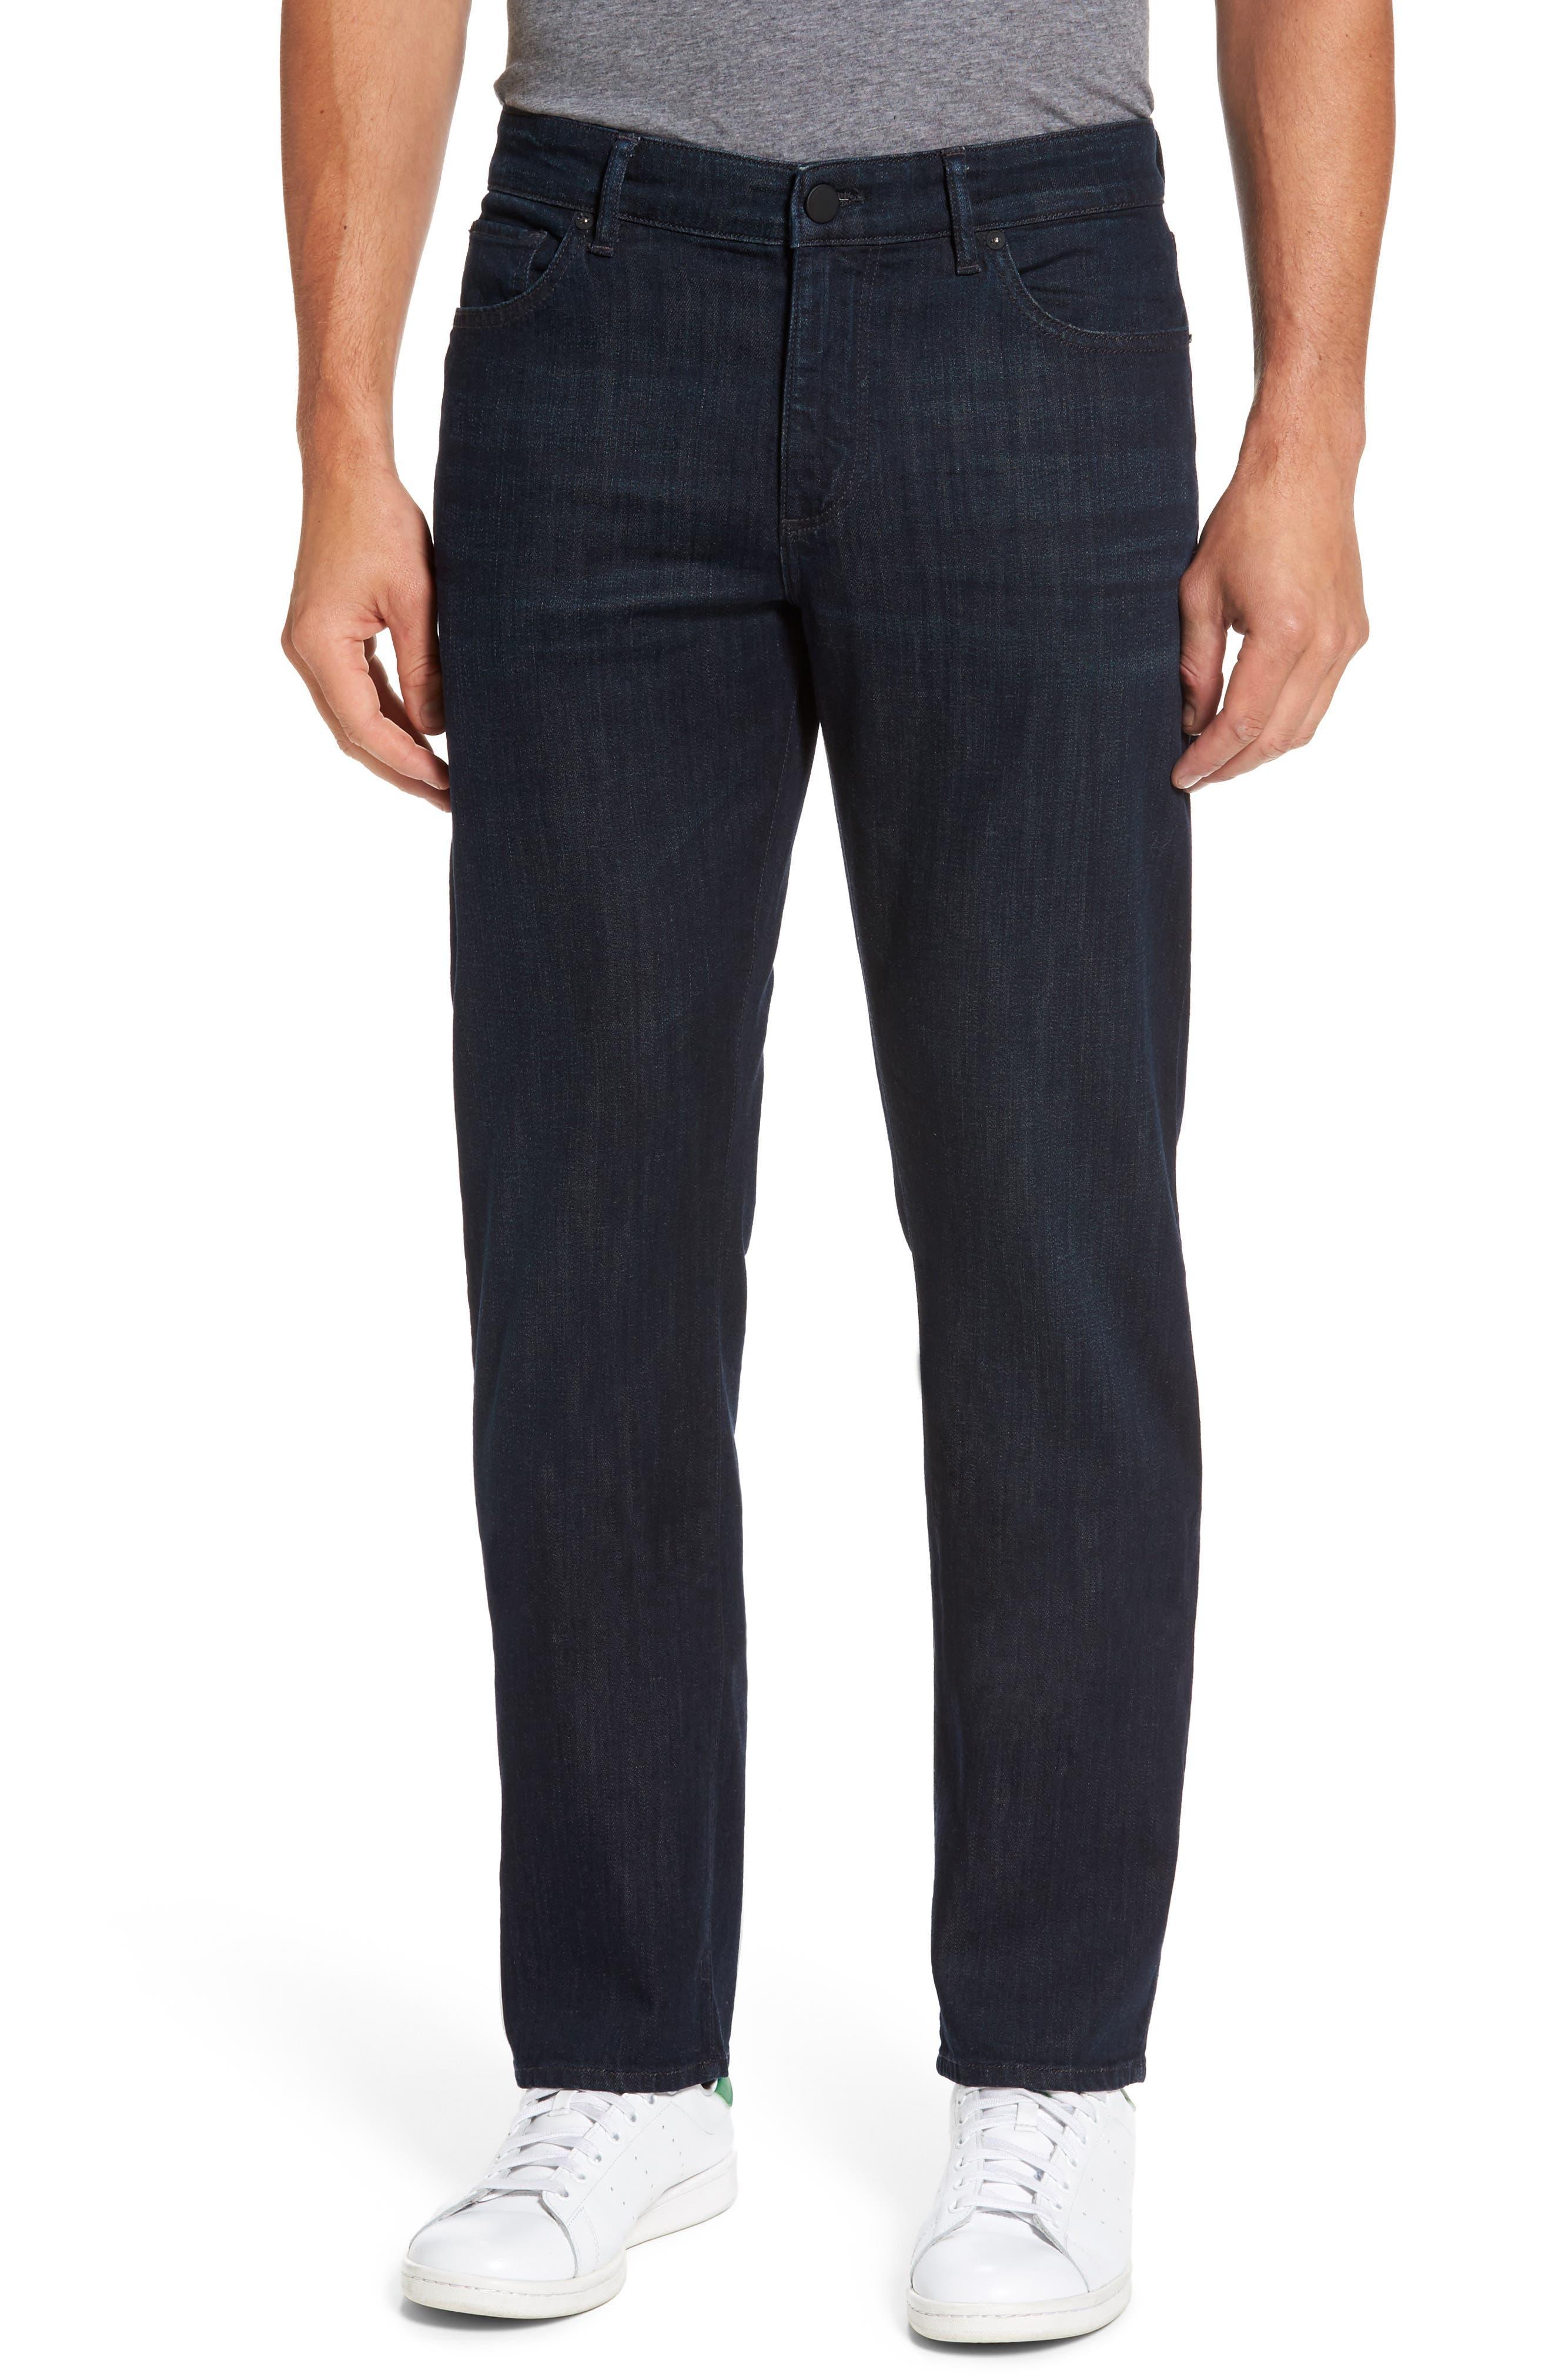 Avery Slim Straight Leg Jeans,                             Main thumbnail 1, color,                             426